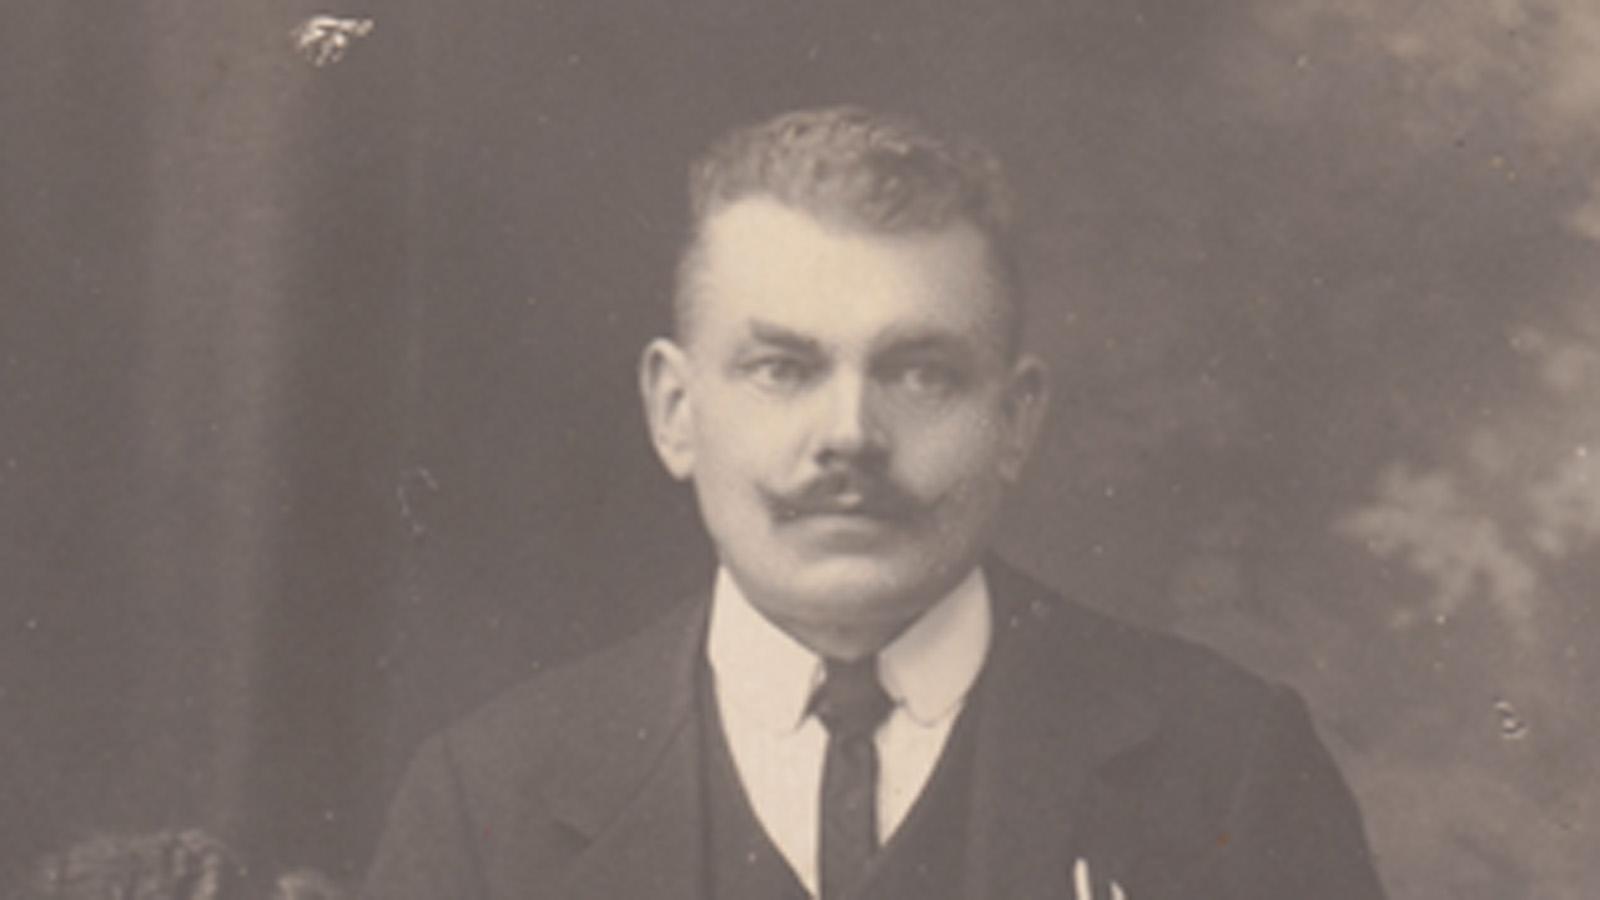 1918-familie-urlaub-1200-detail-2.jpg